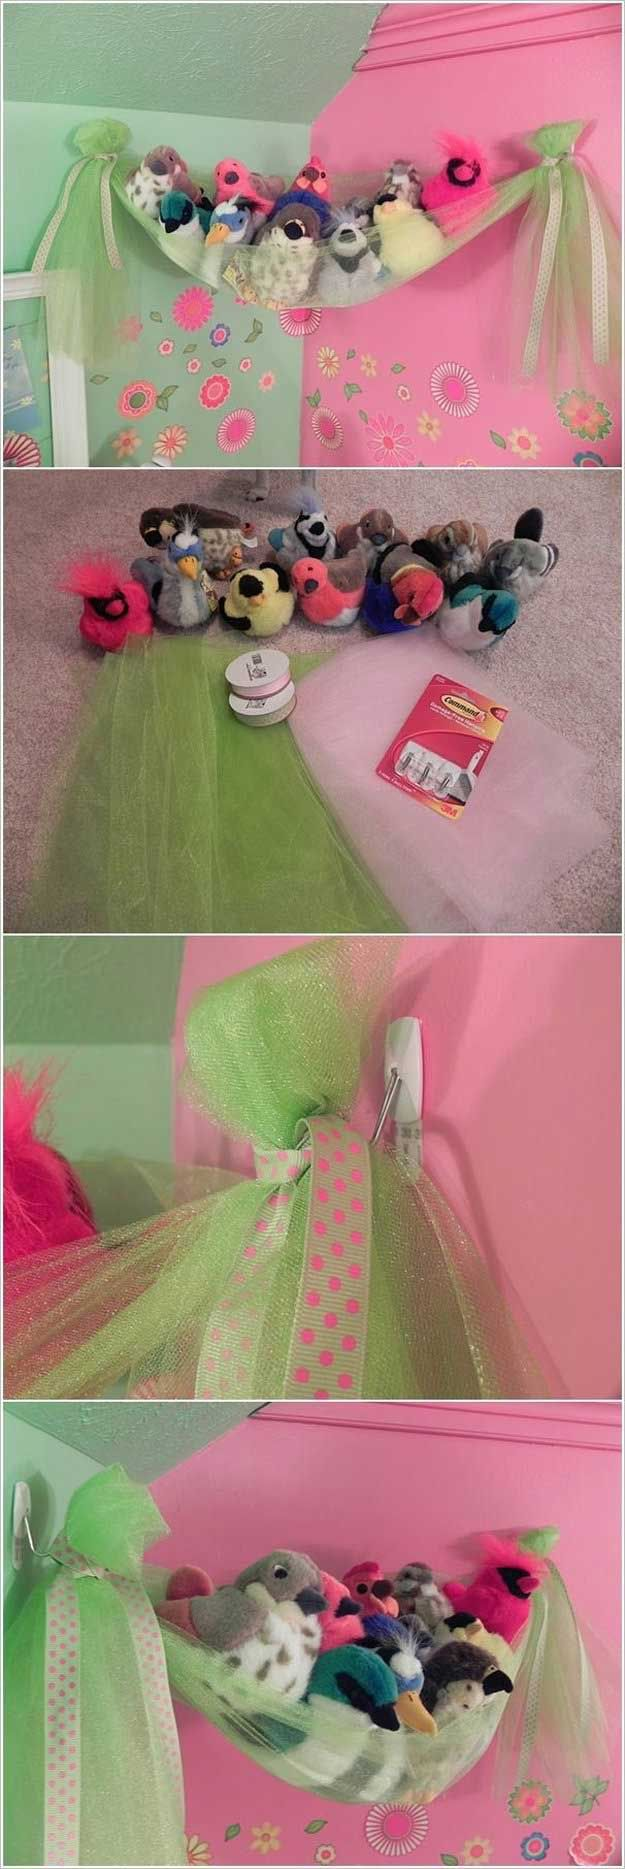 Fancy Birdu0027s Nest | 24 Smart DIY Toy U0026 Crafts Storage Solutions | Home Organization  Ideas